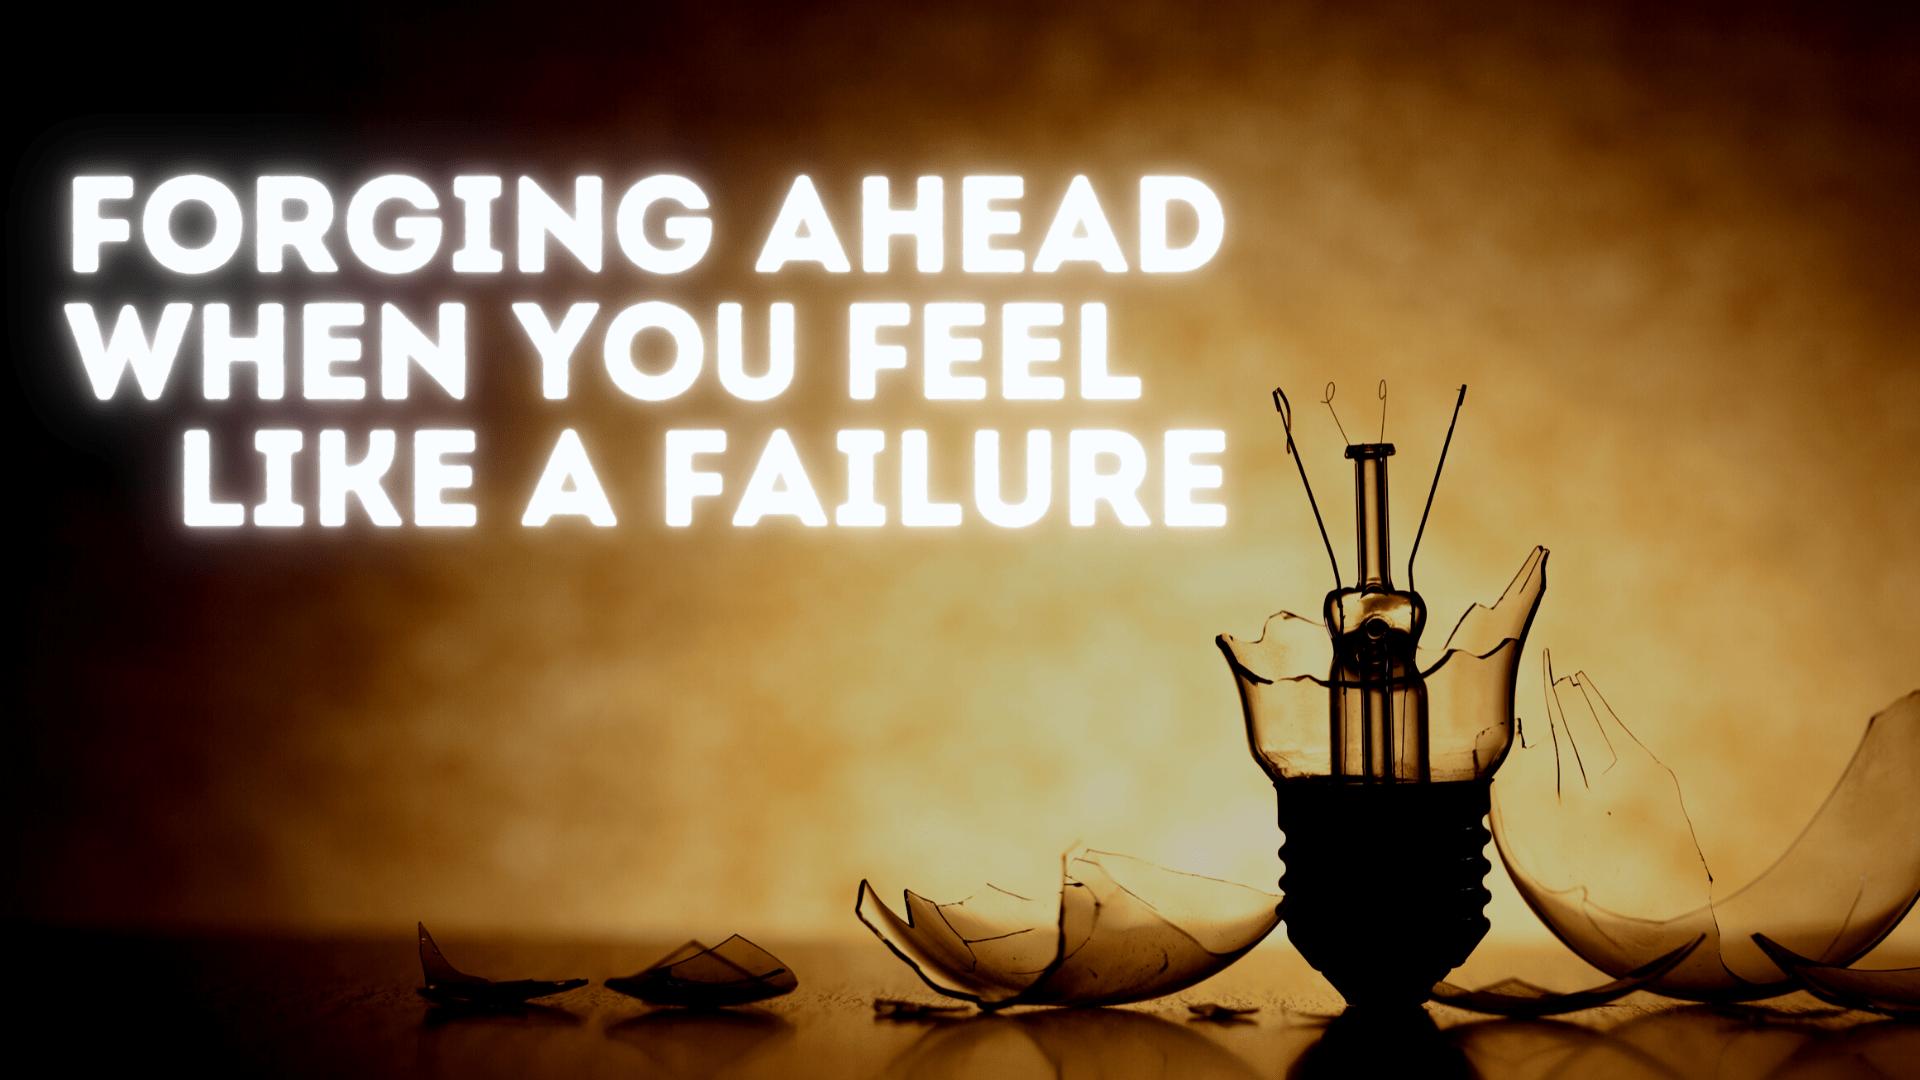 Forging Ahead when you Feel like a Failure